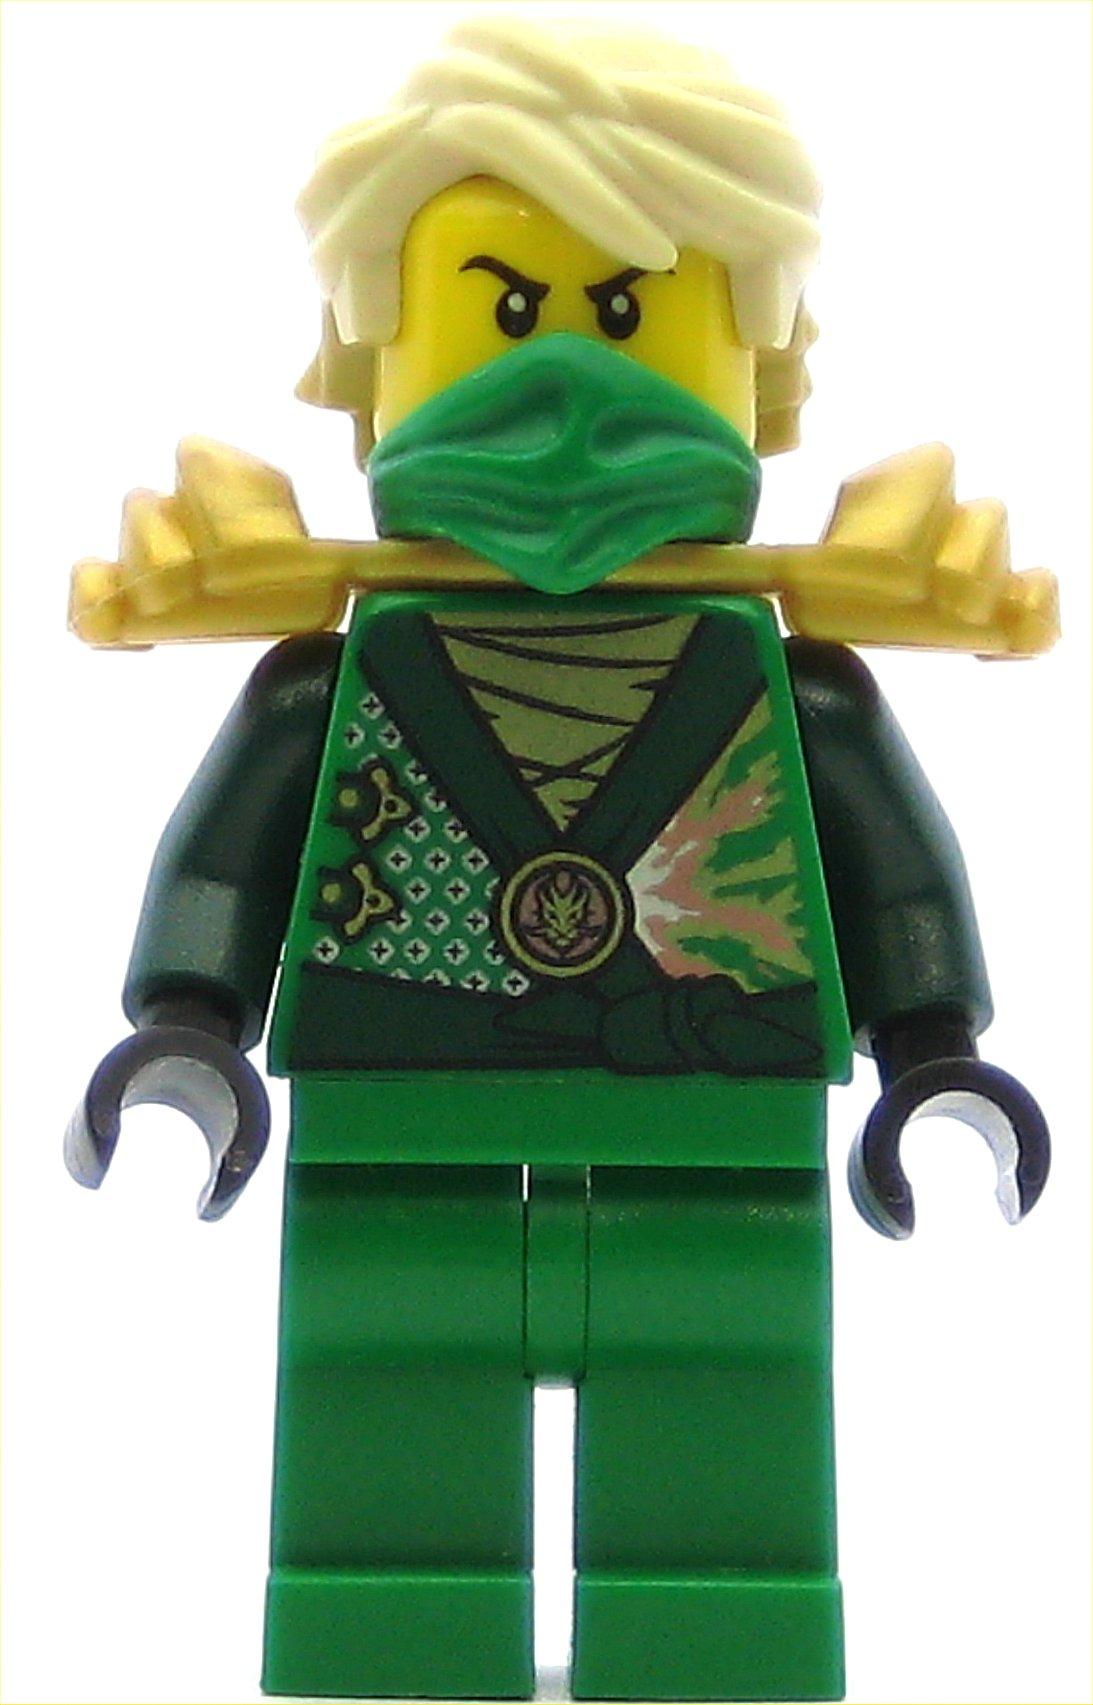 LEGO Ninjago Minifigure Lloyd Rebooted with Gold Armor